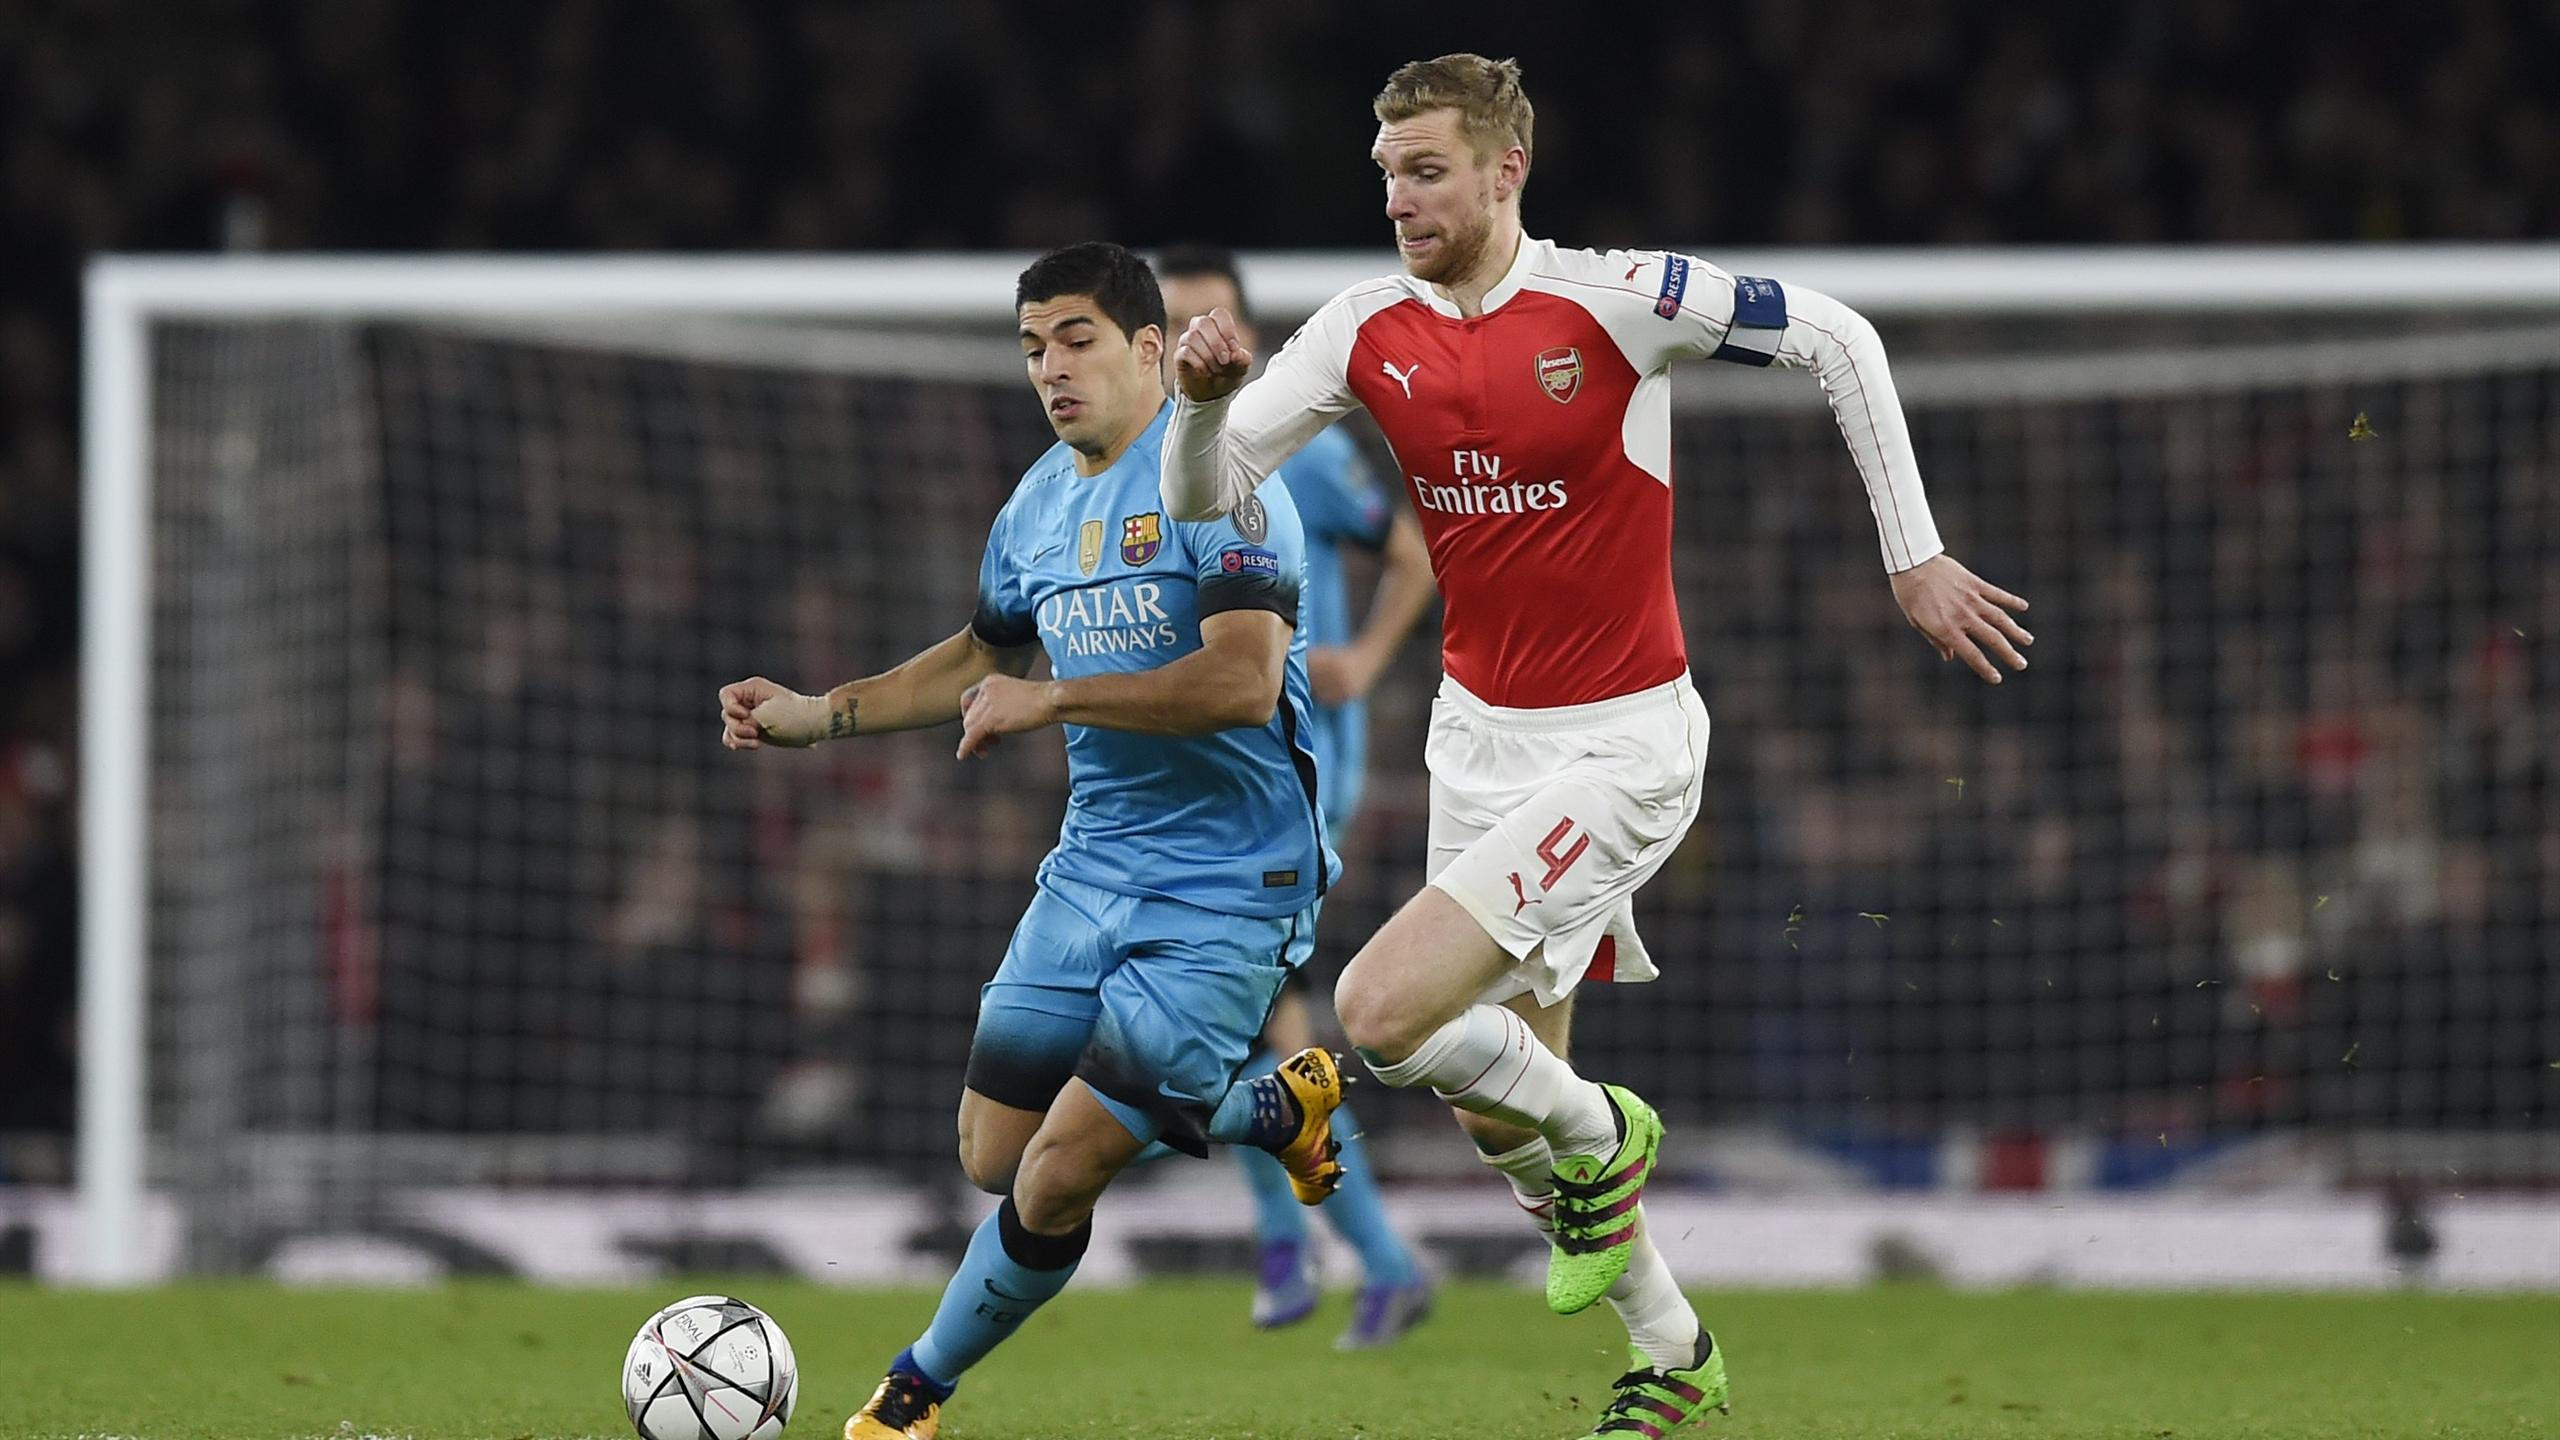 Barcelona's Luis Suarez in action with Arsenal's Per Mertesacker